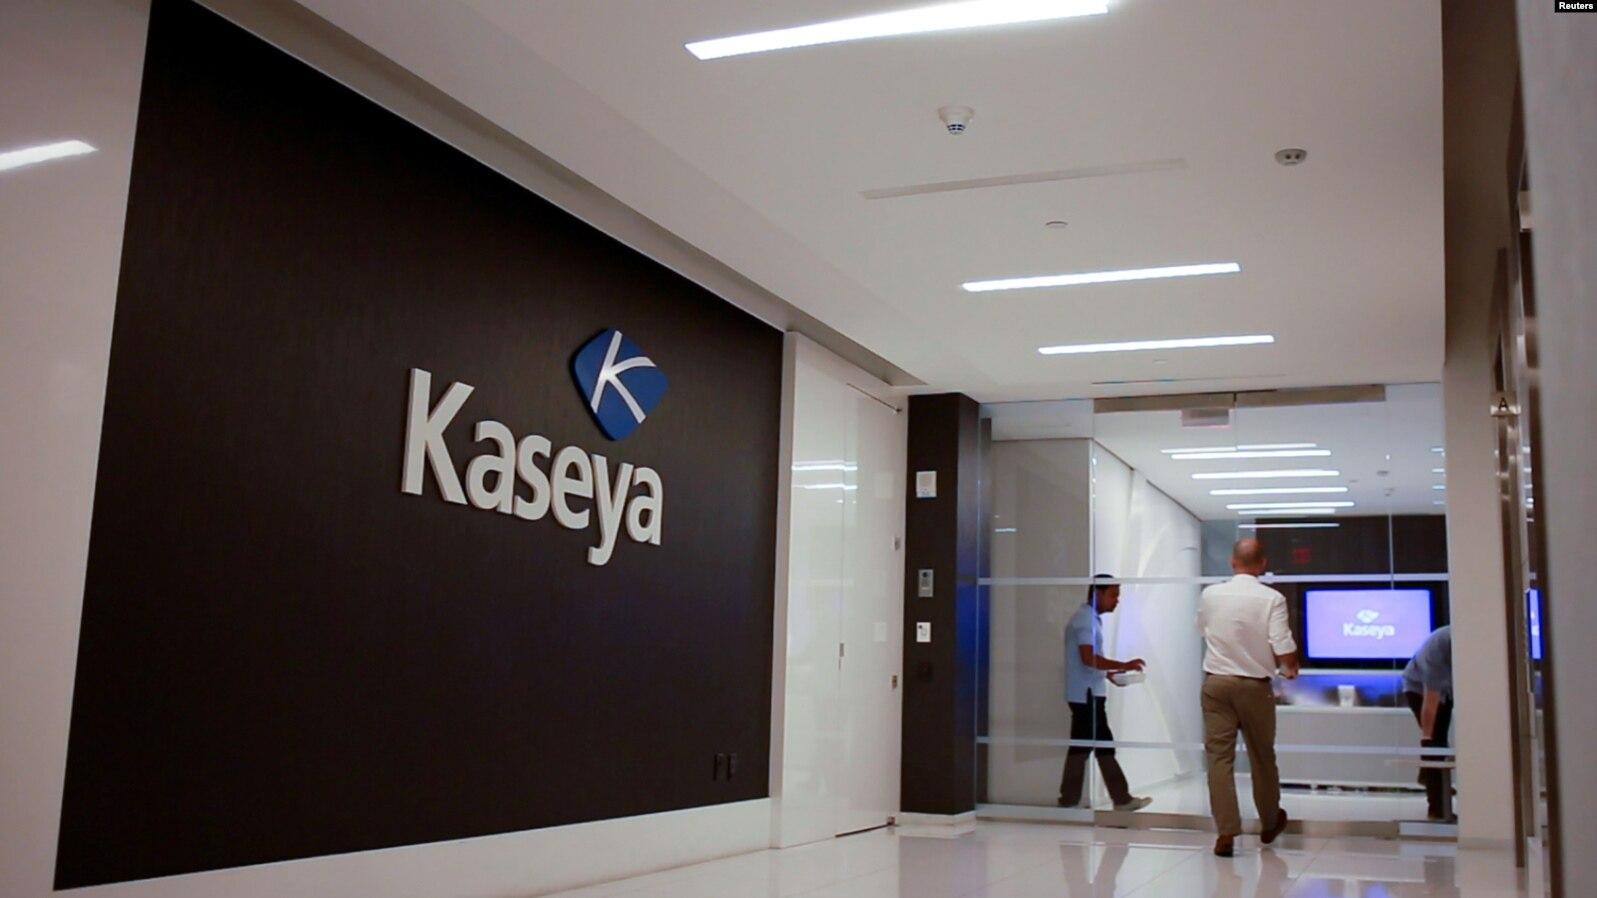 technology firm Kaseya